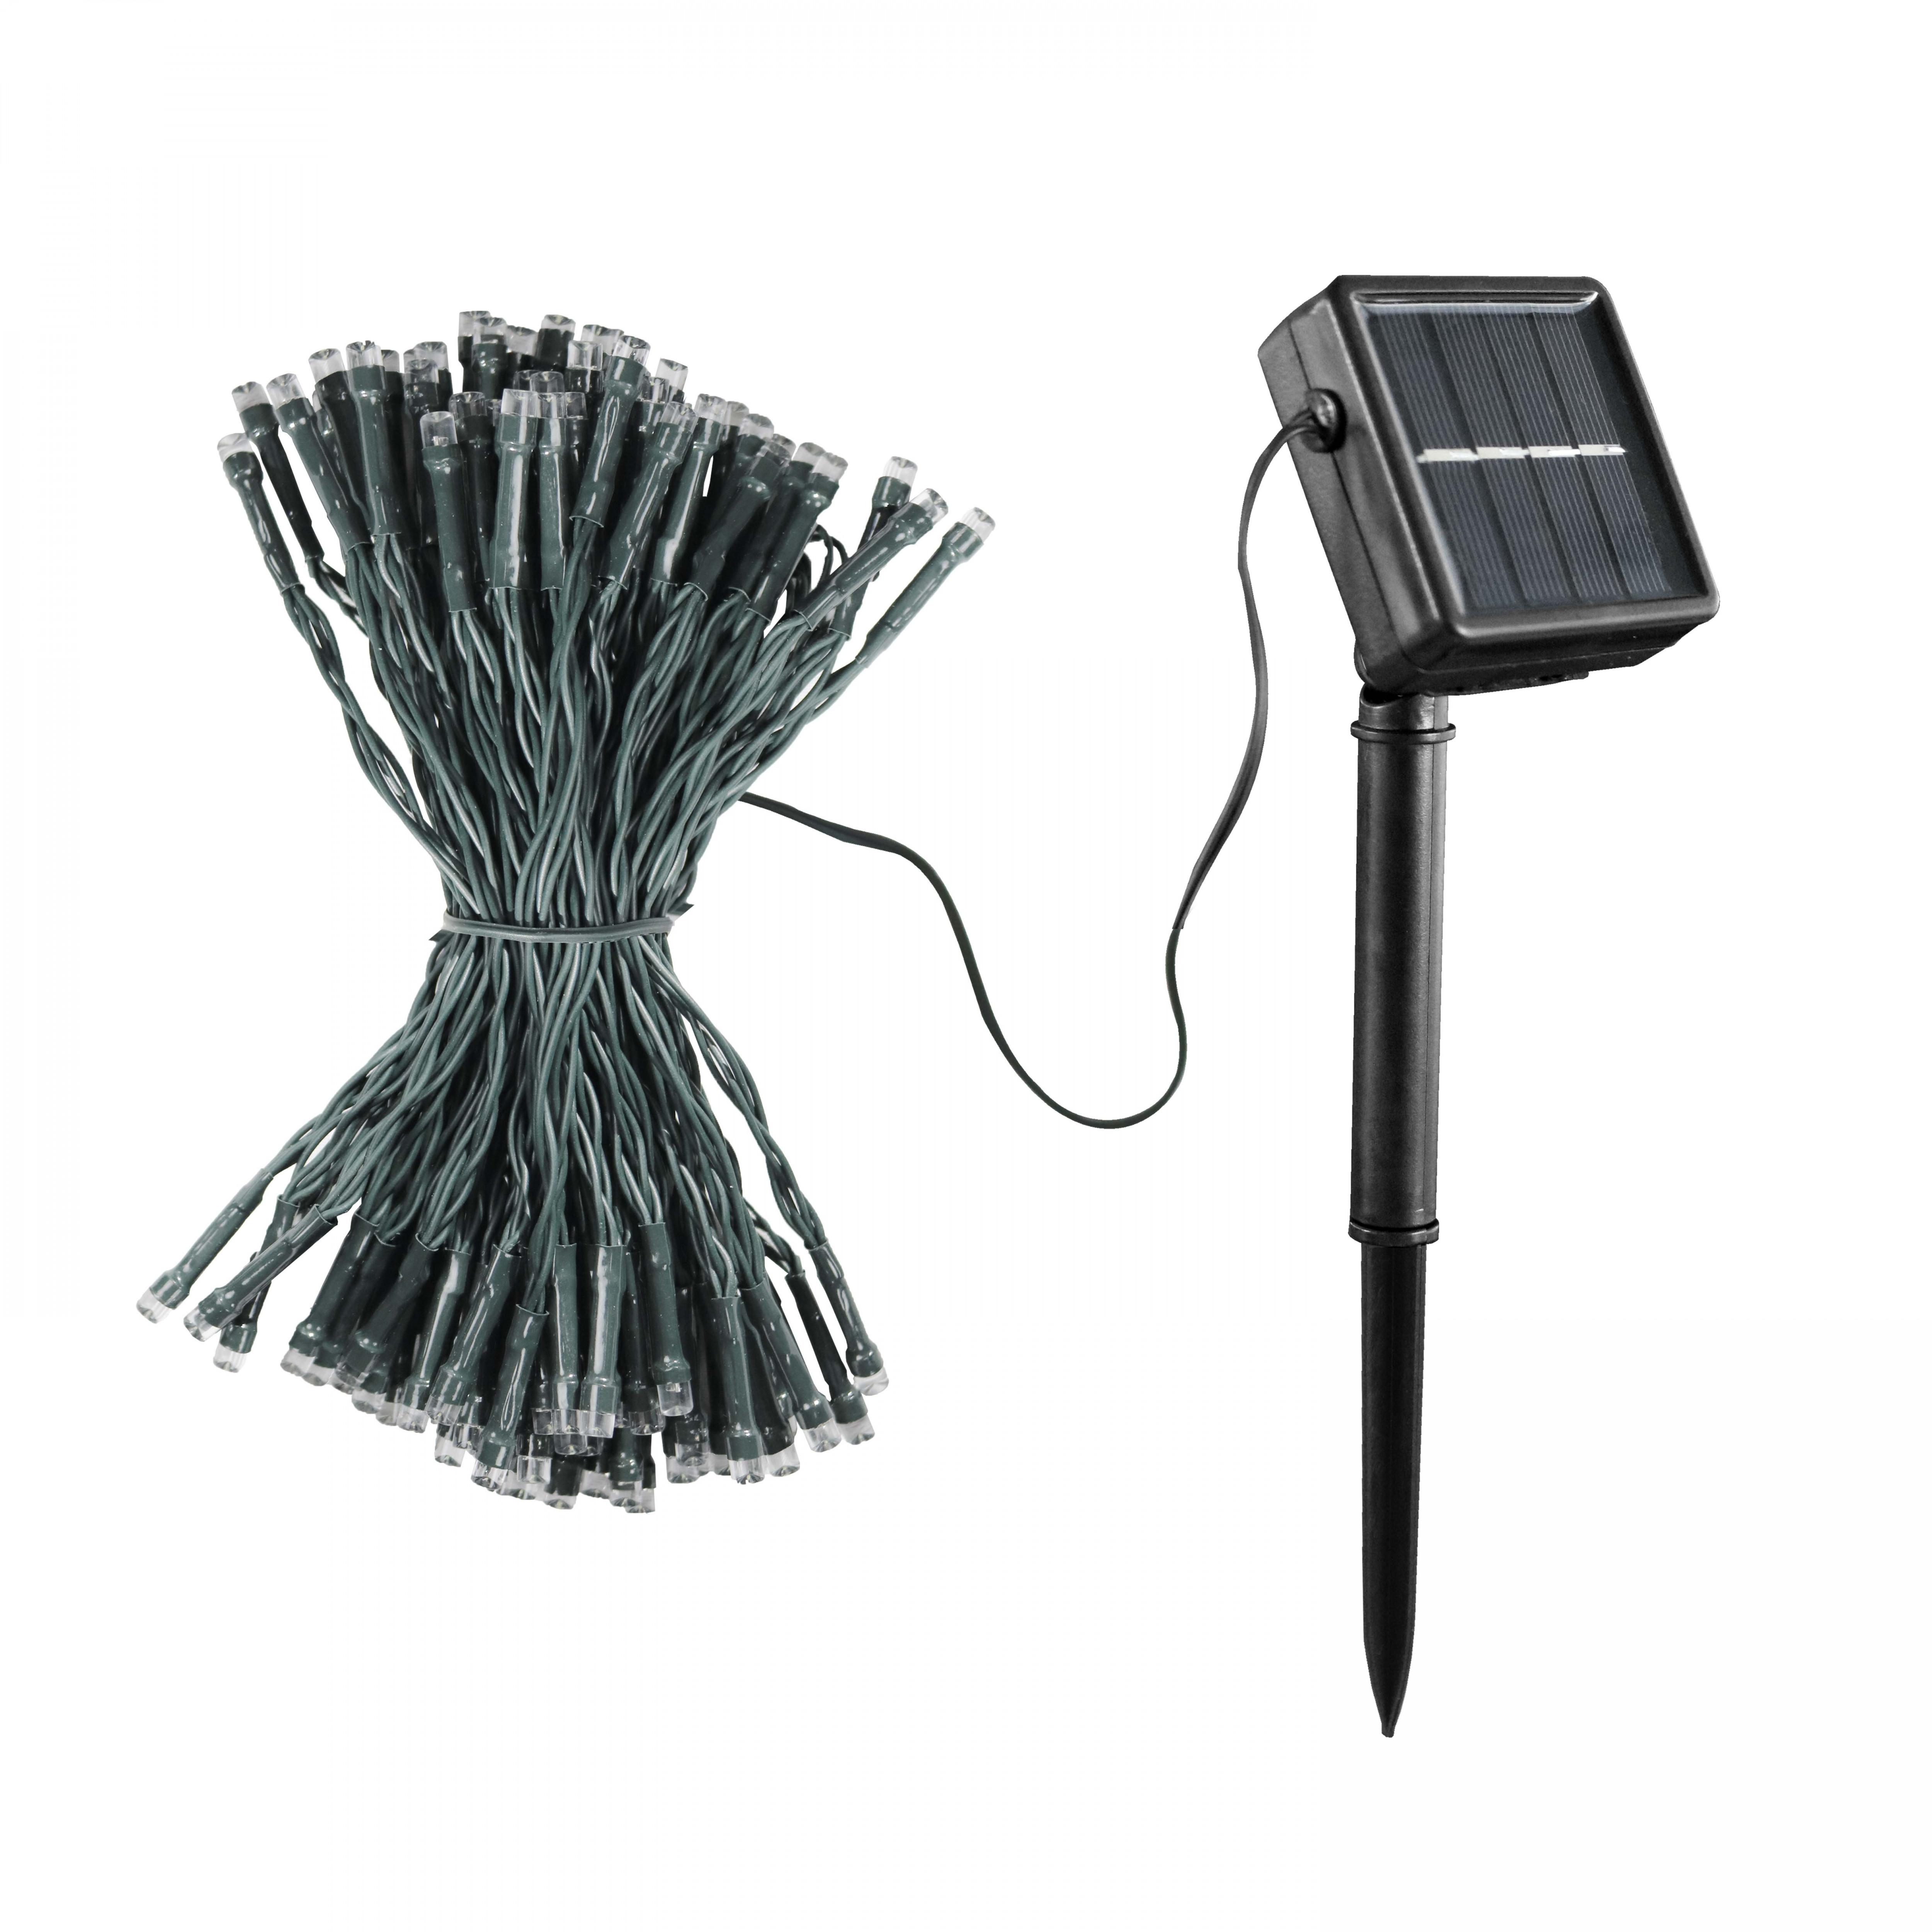 Guirlande solaire 200 LED 22m blanc